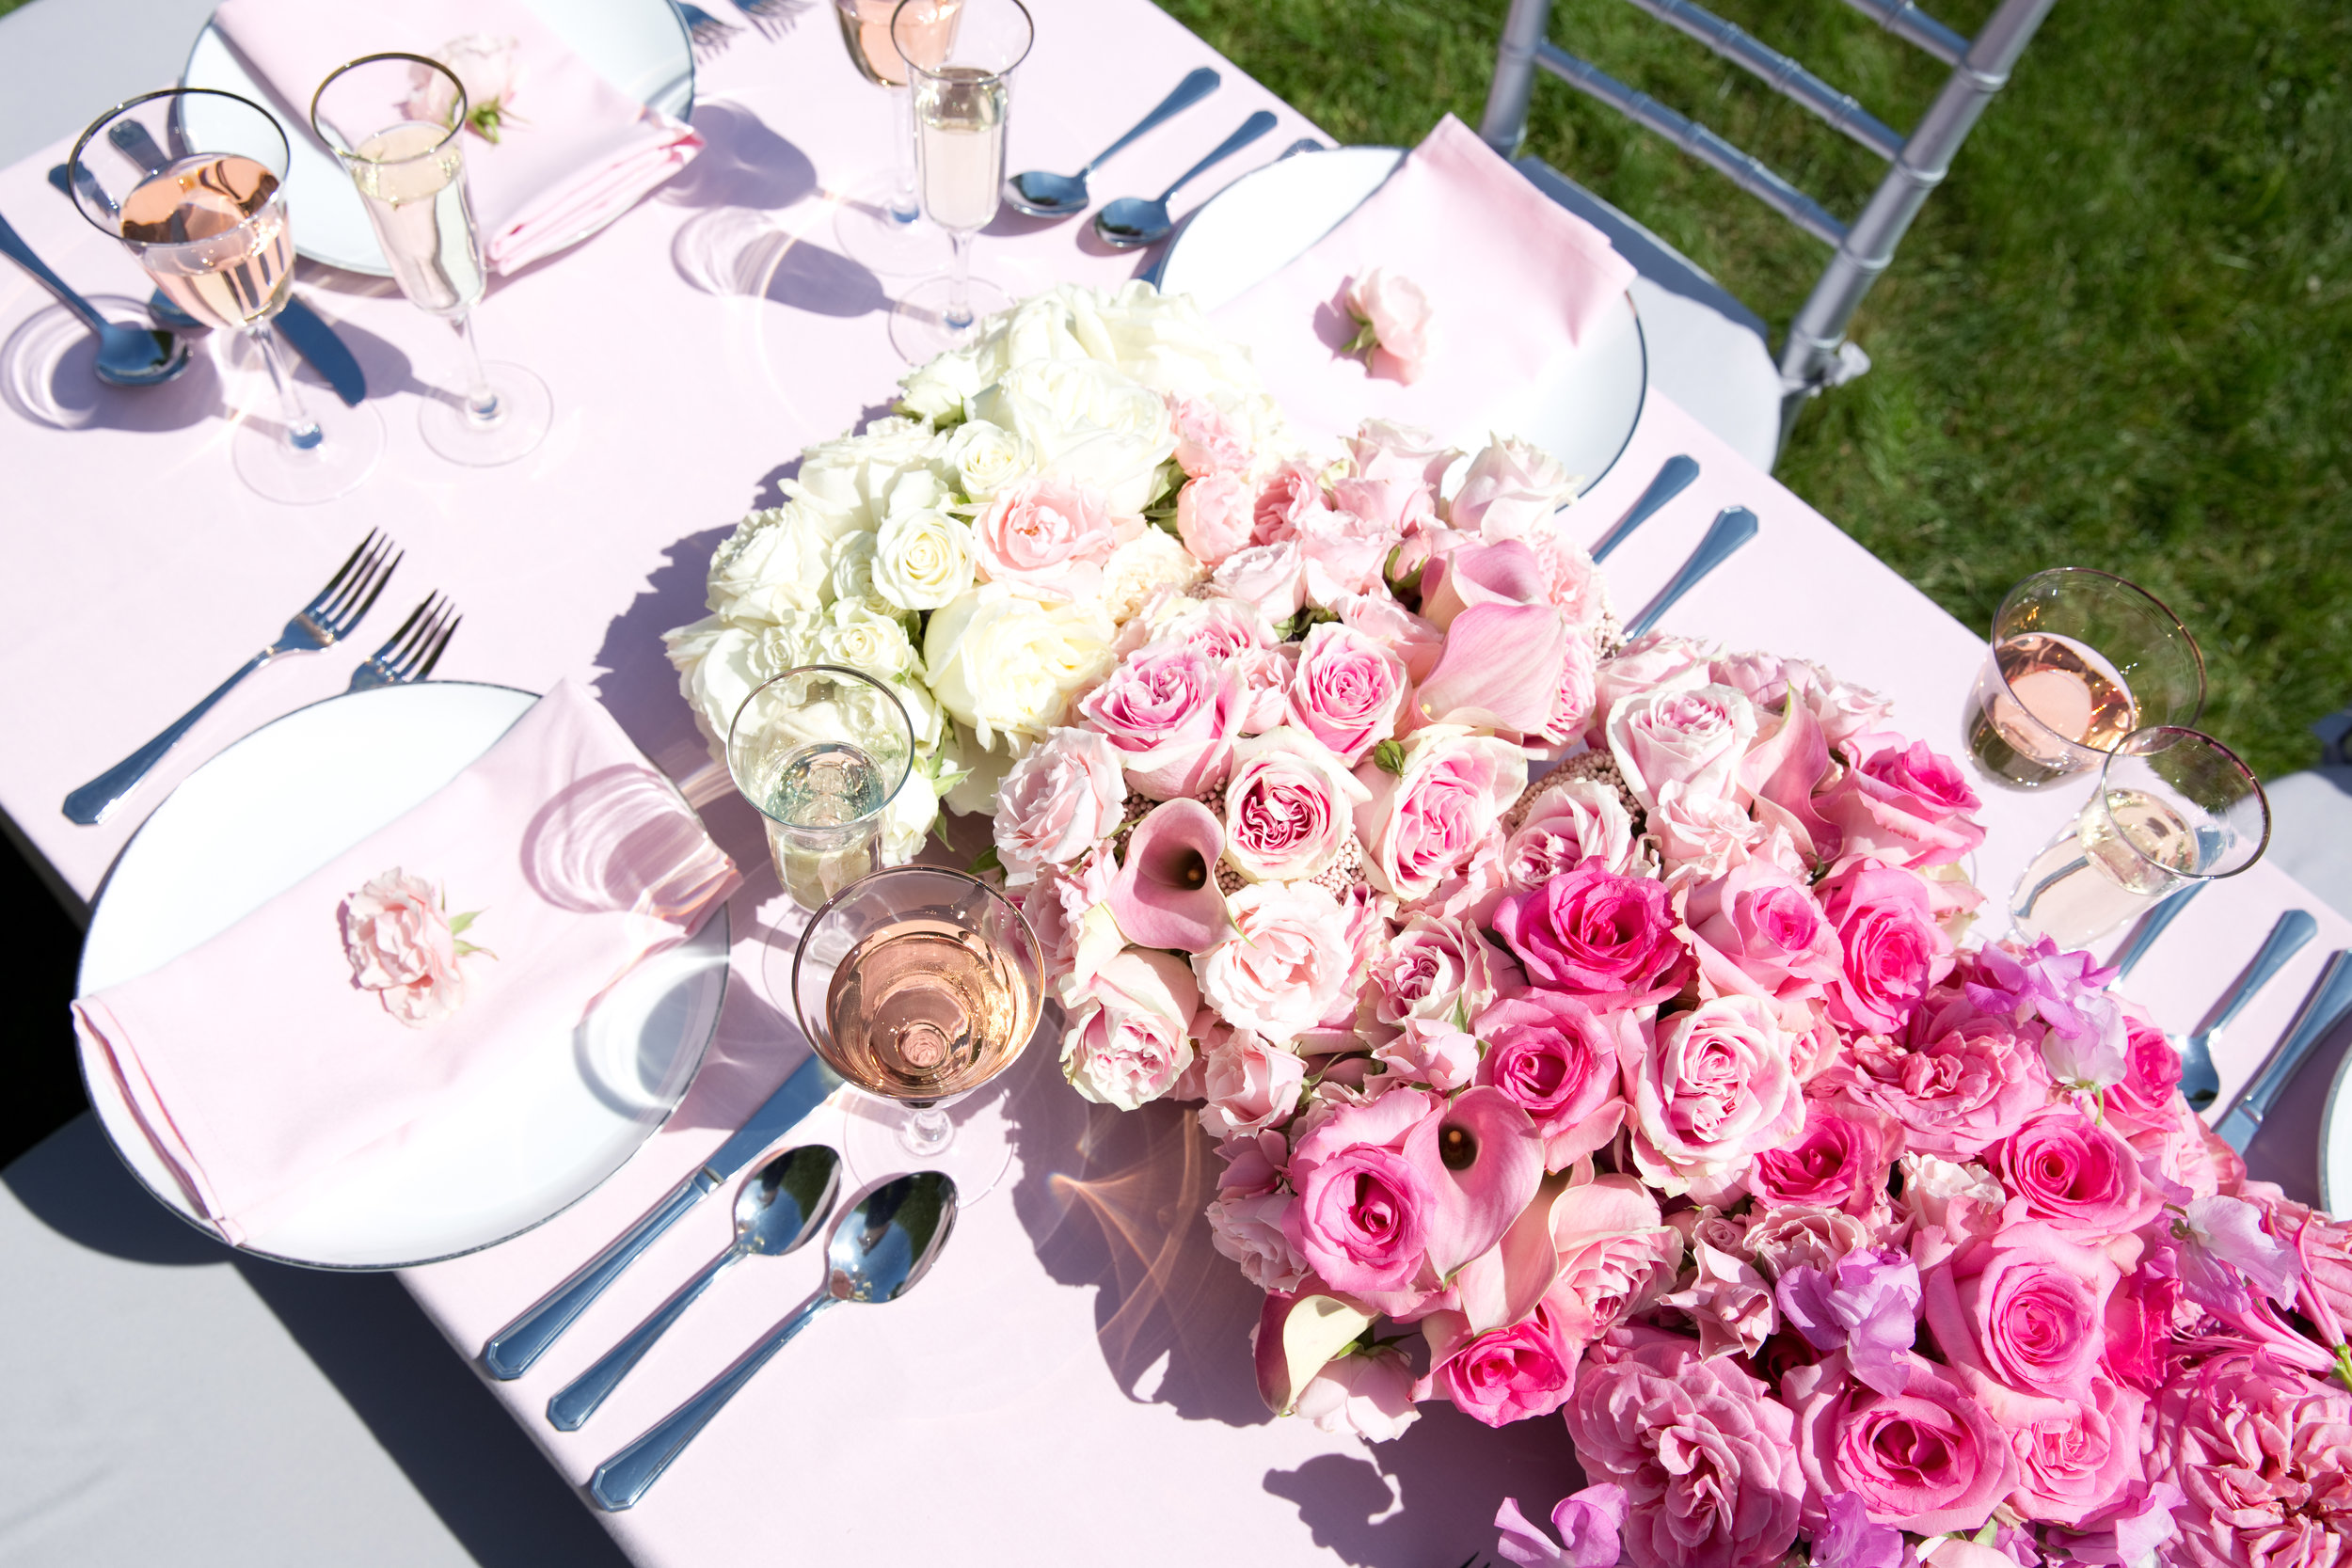 Pink Ombré Floral Table Runner